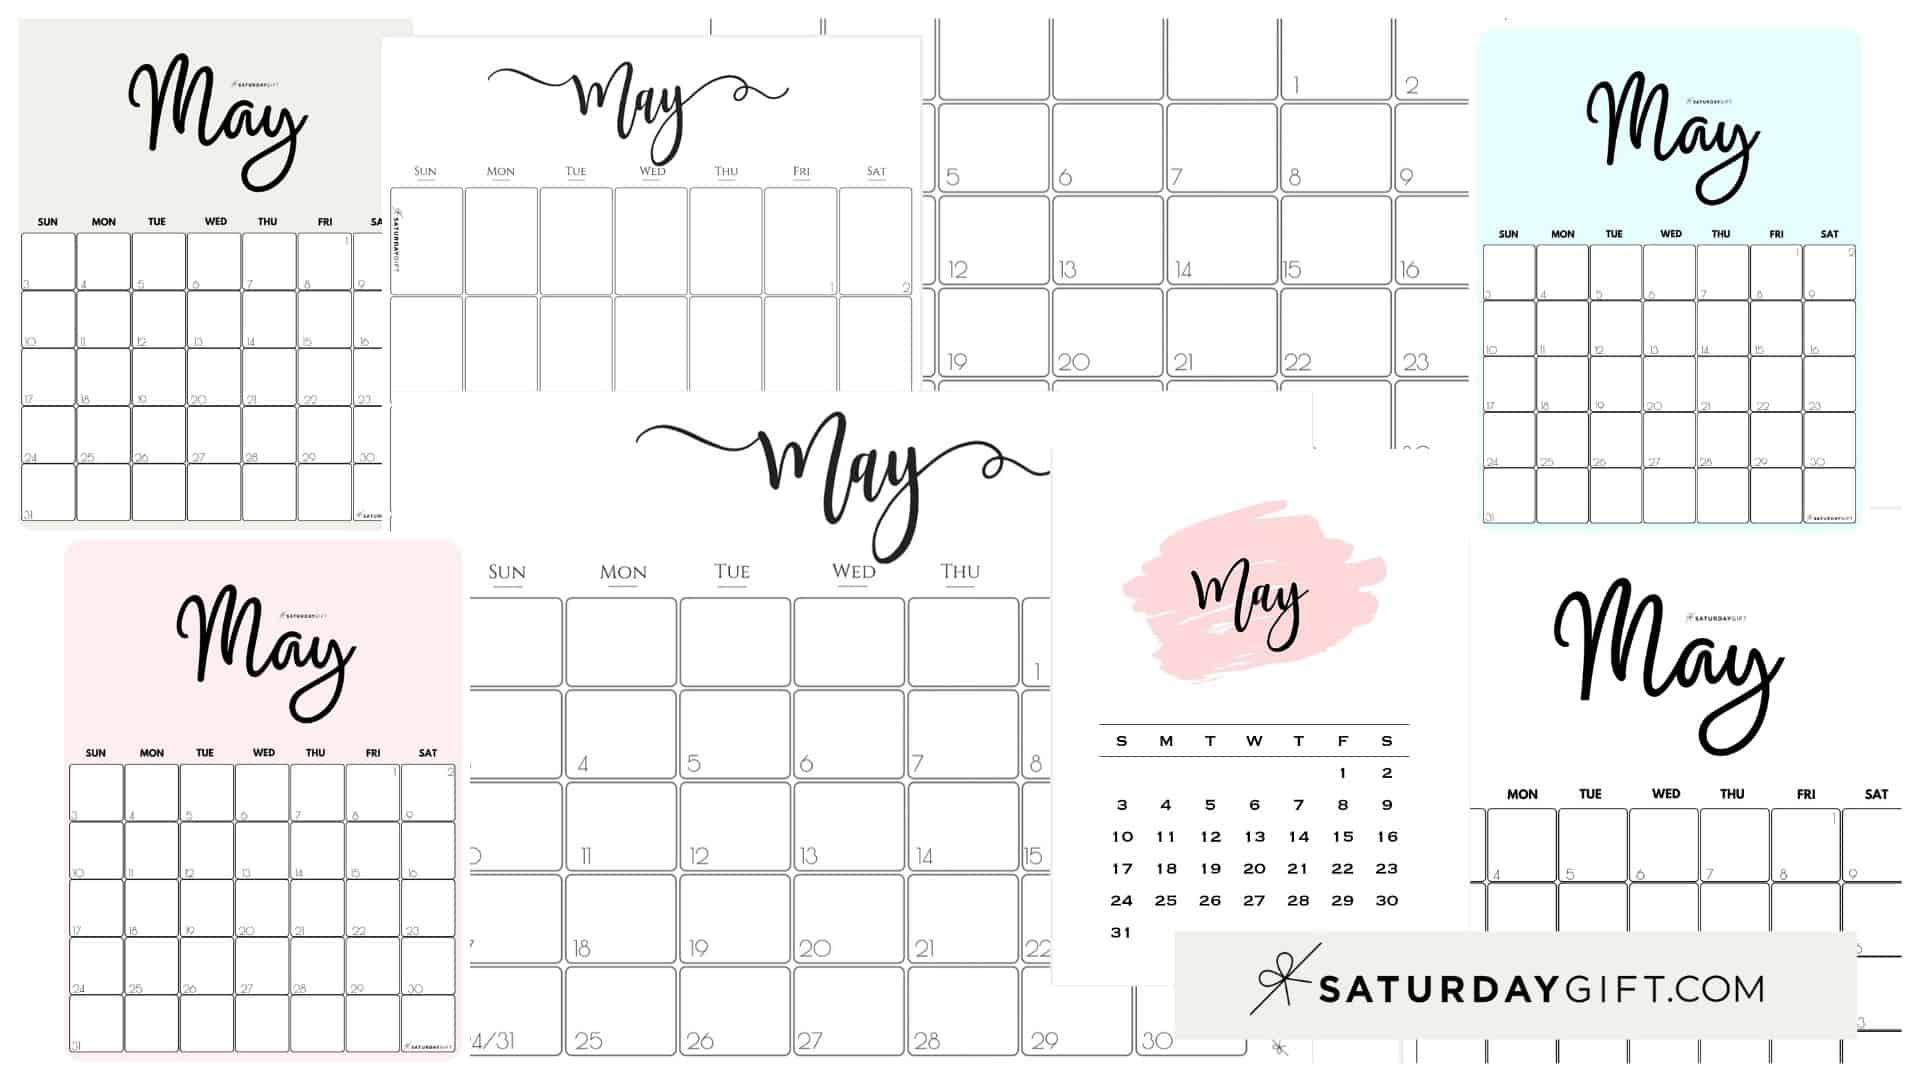 2022 Cute Printable Monthly Calendar.Cute Free Printable May 2021 Calendar Saturdaygift